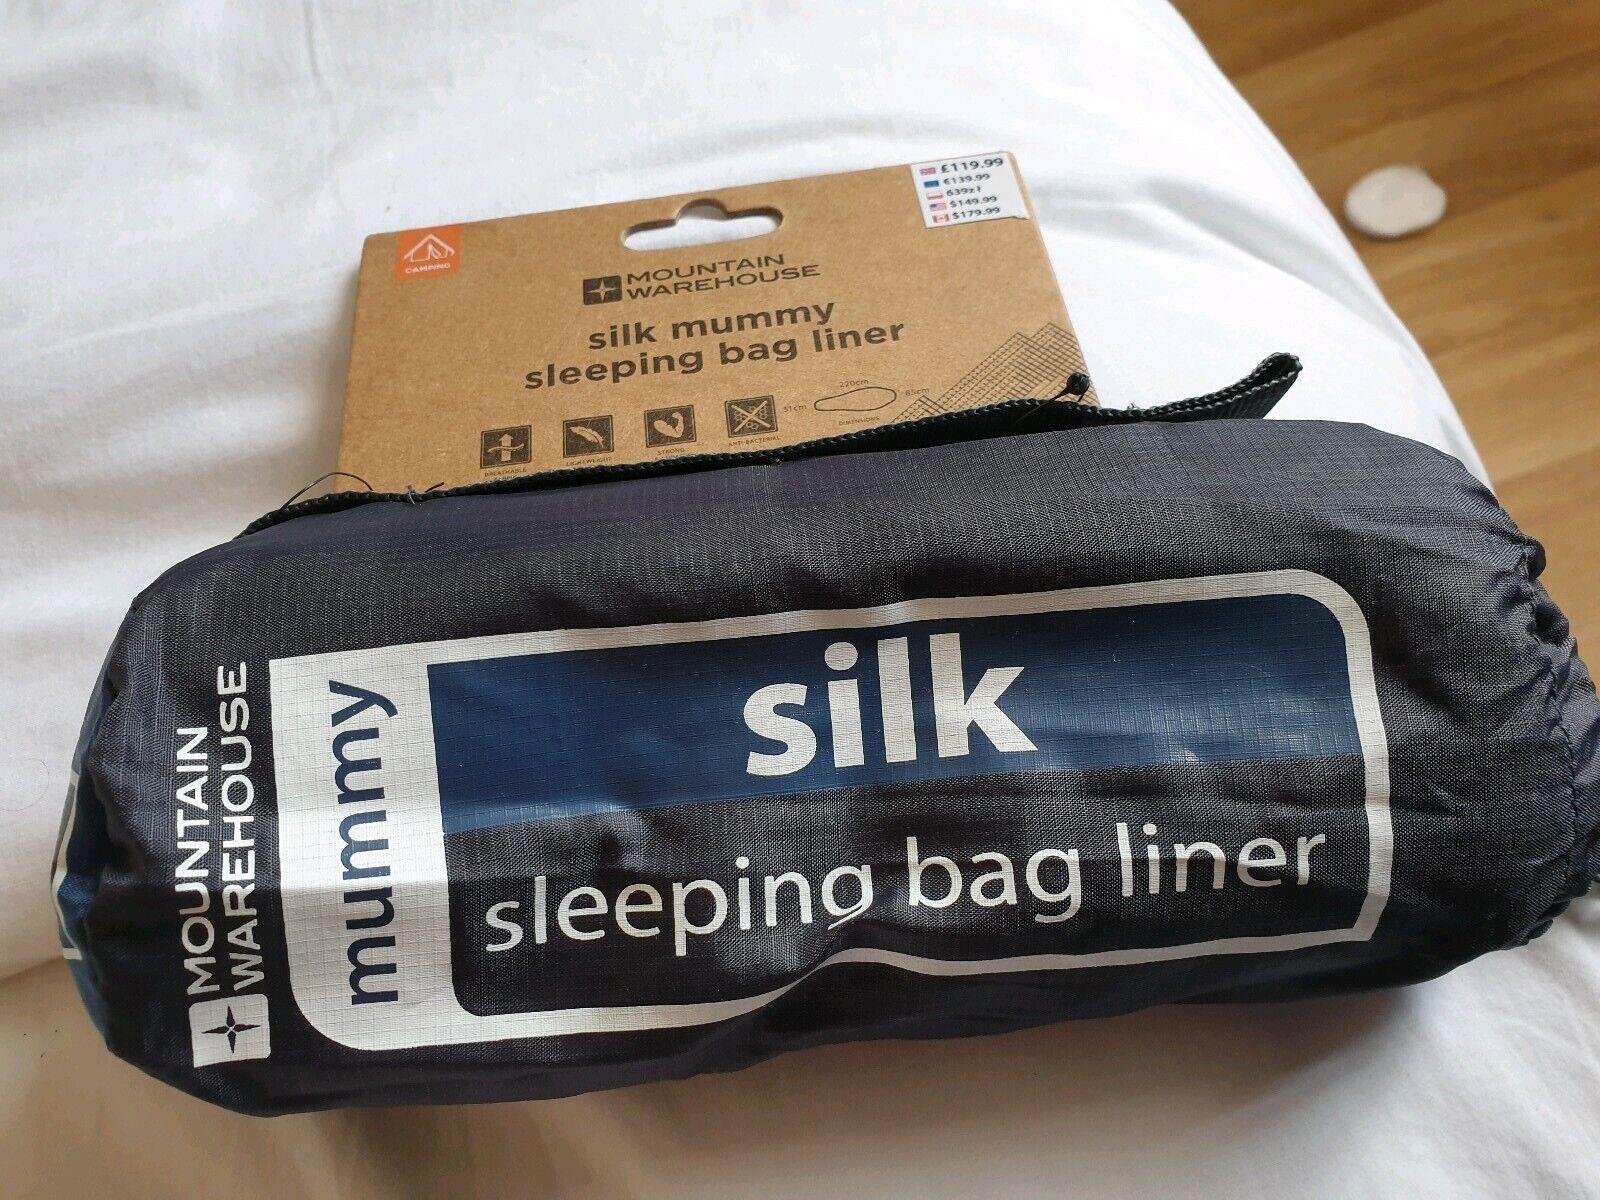 Mountain Warehouse Mummy Silk  Sleeping Bag Liner  brand